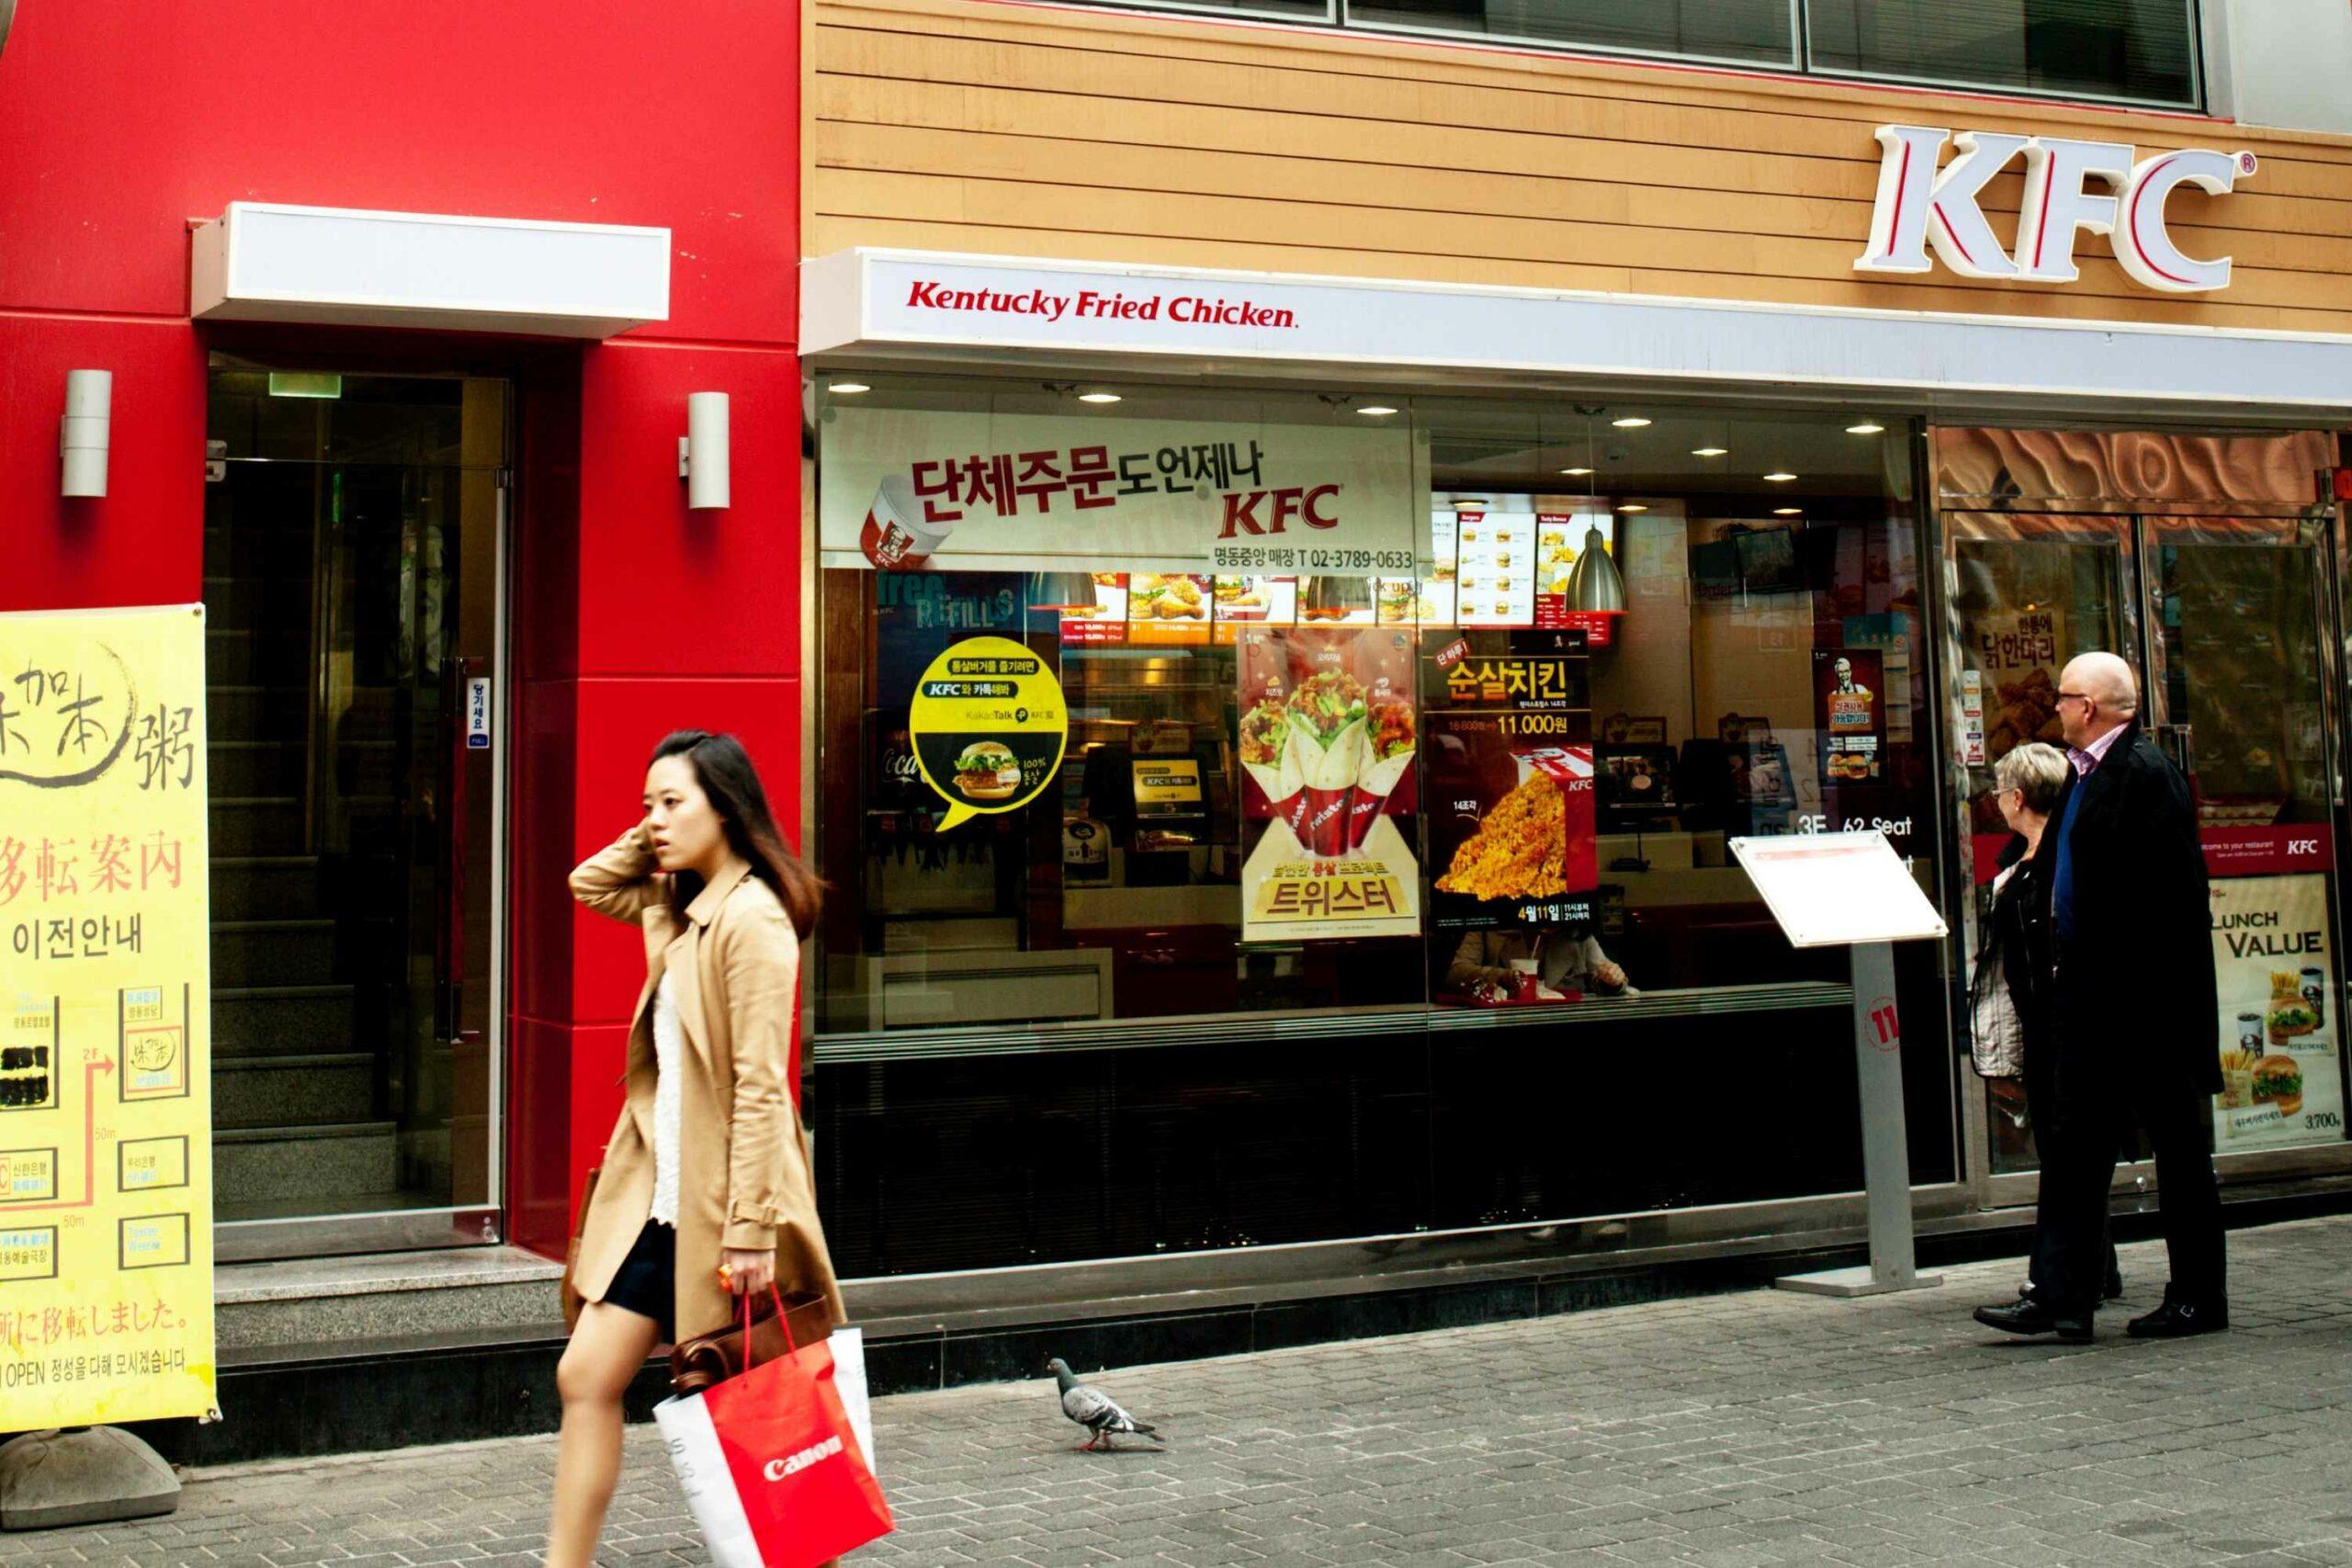 Woman walking past KFC store front